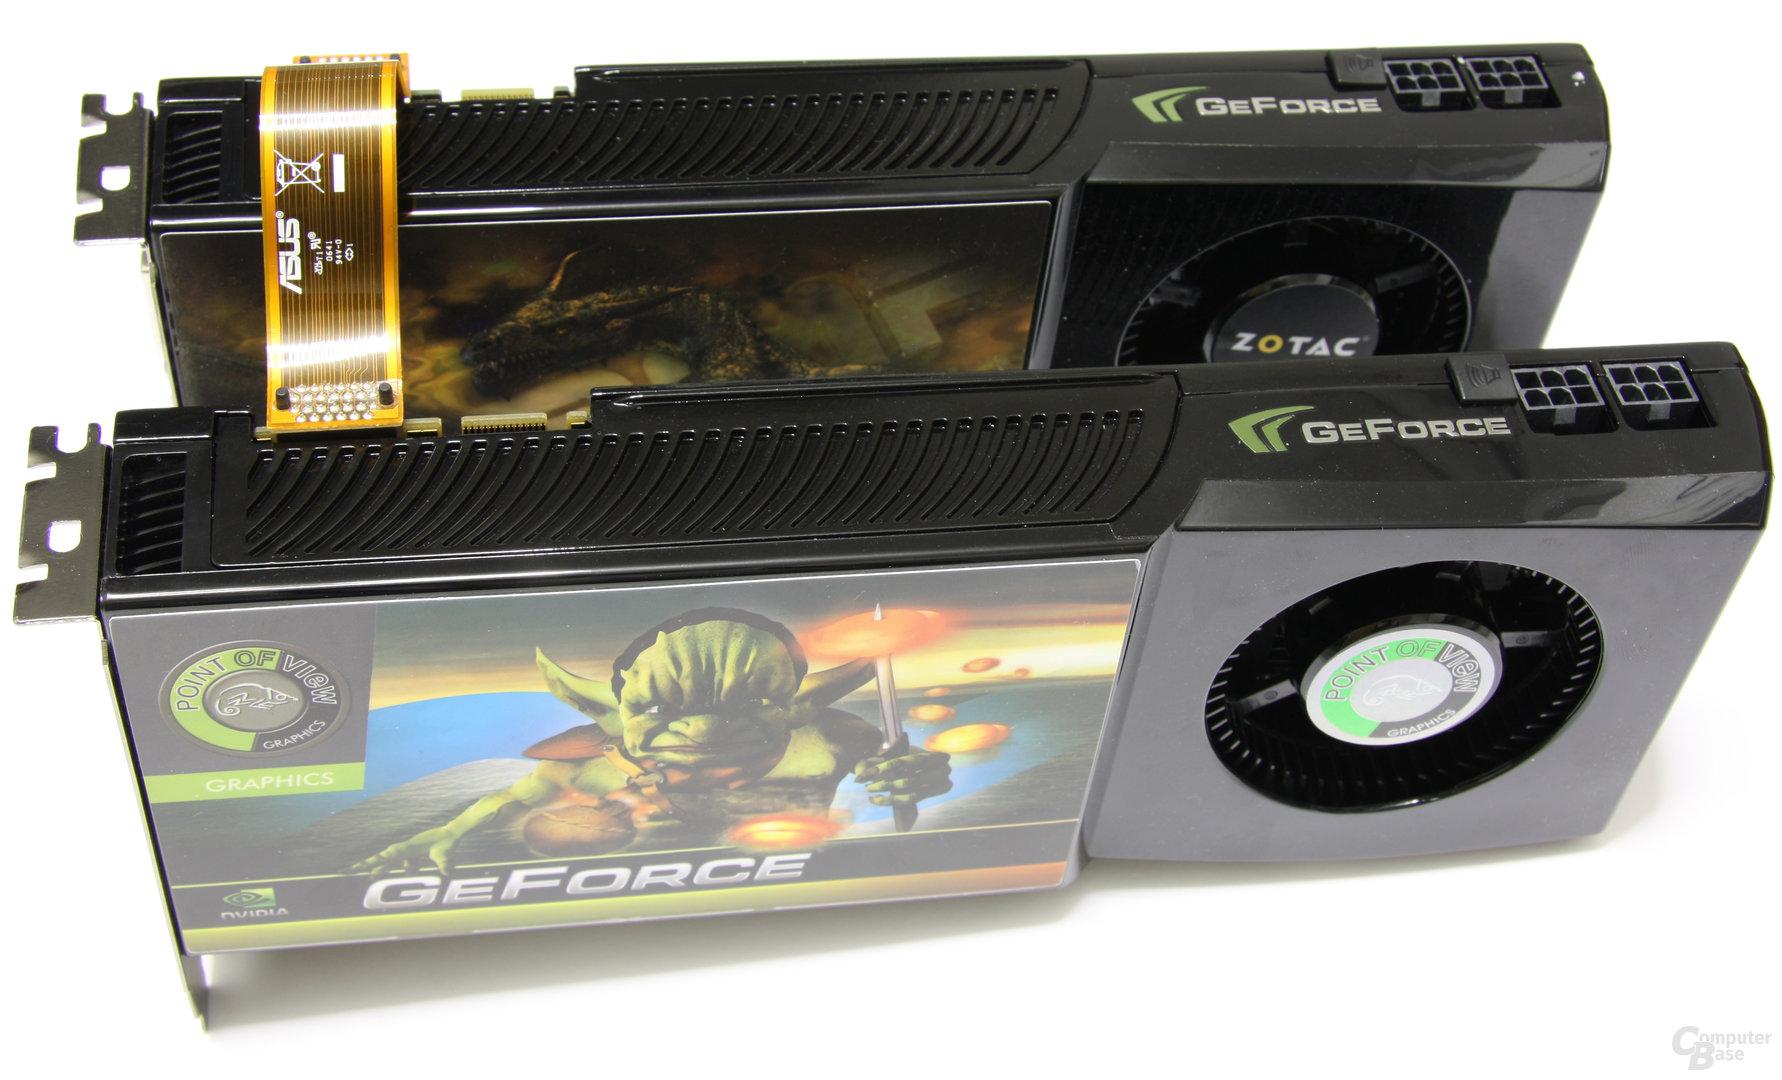 GeForce GTX 260 SLI